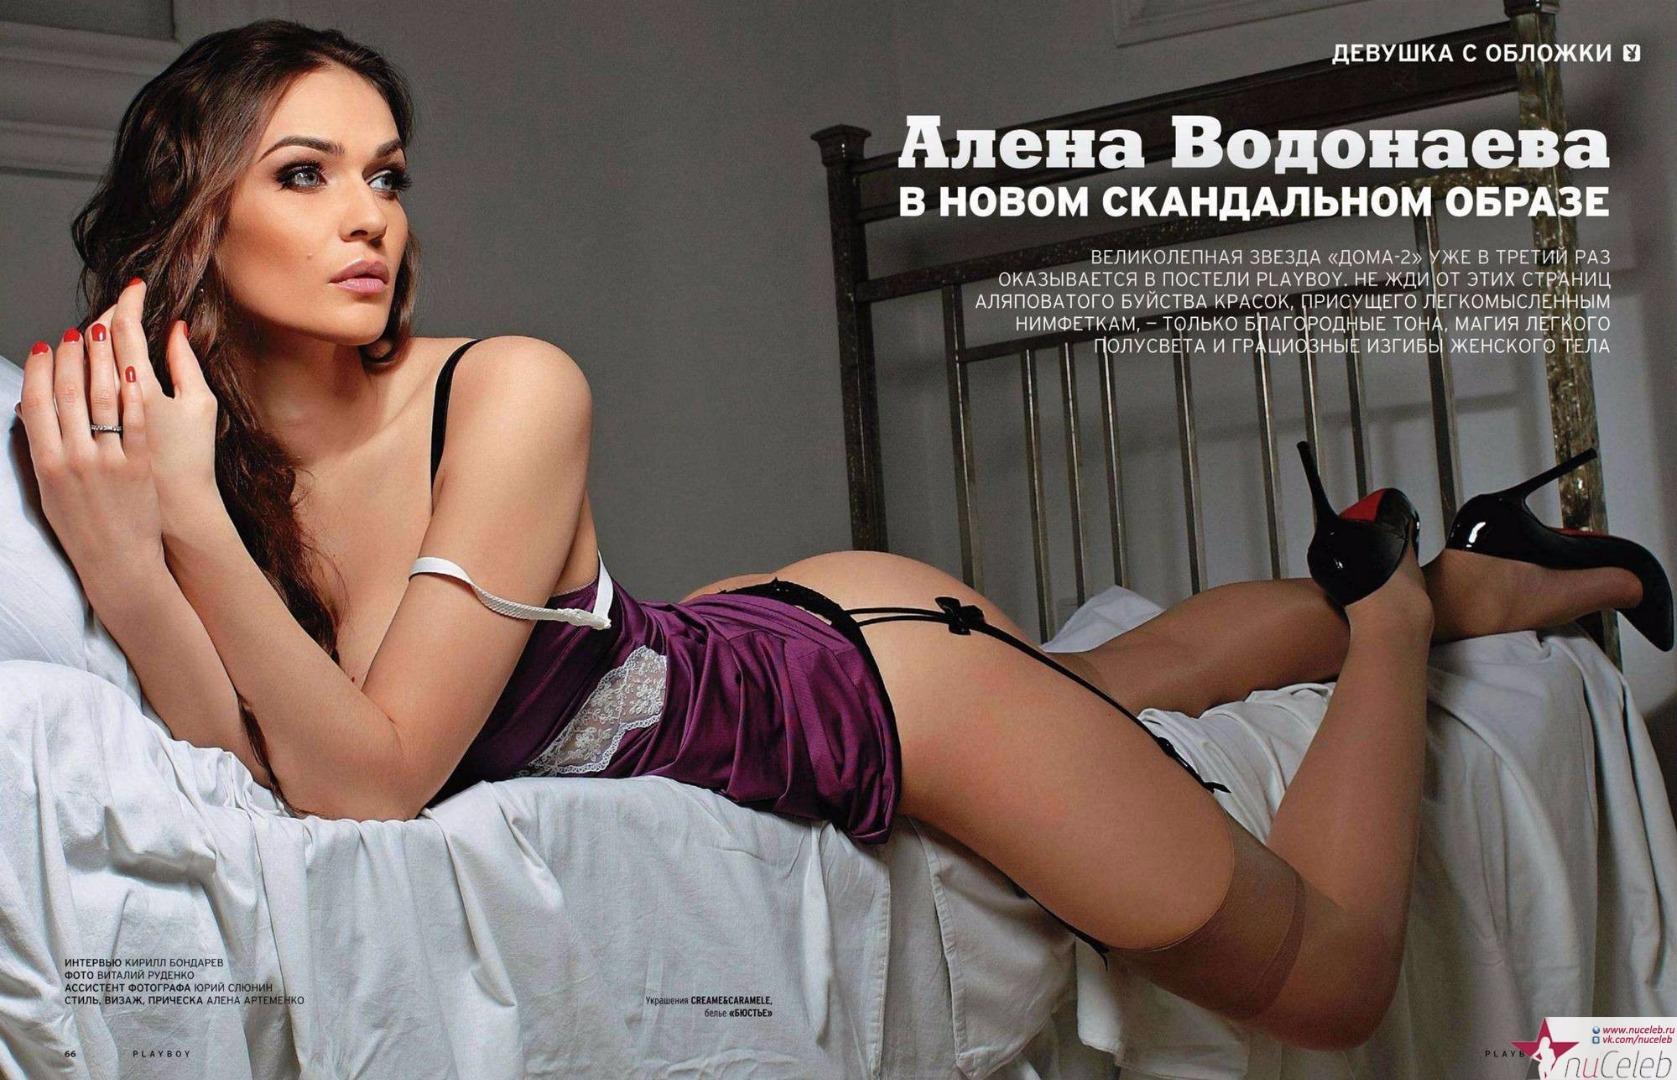 Степан меньшиков и алена водонаева интим 28 фотография